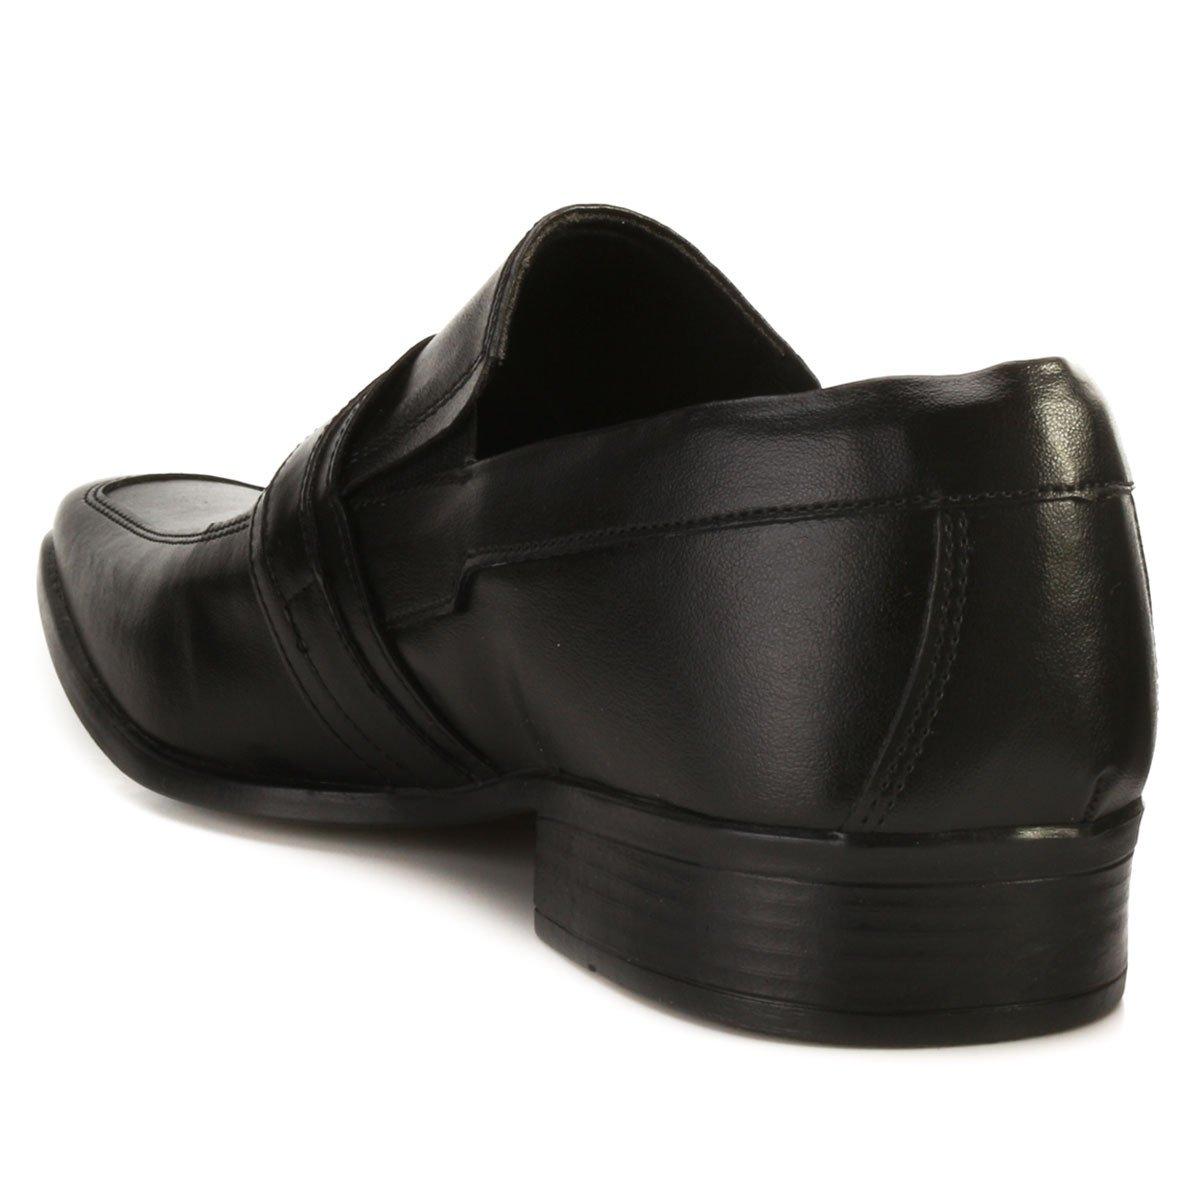 Faraton Faraton 7008 Sapato Faraton Preto Sapato Sapato Sapato Preto Faraton 7008 7008 7008 Preto YqTCxpwq